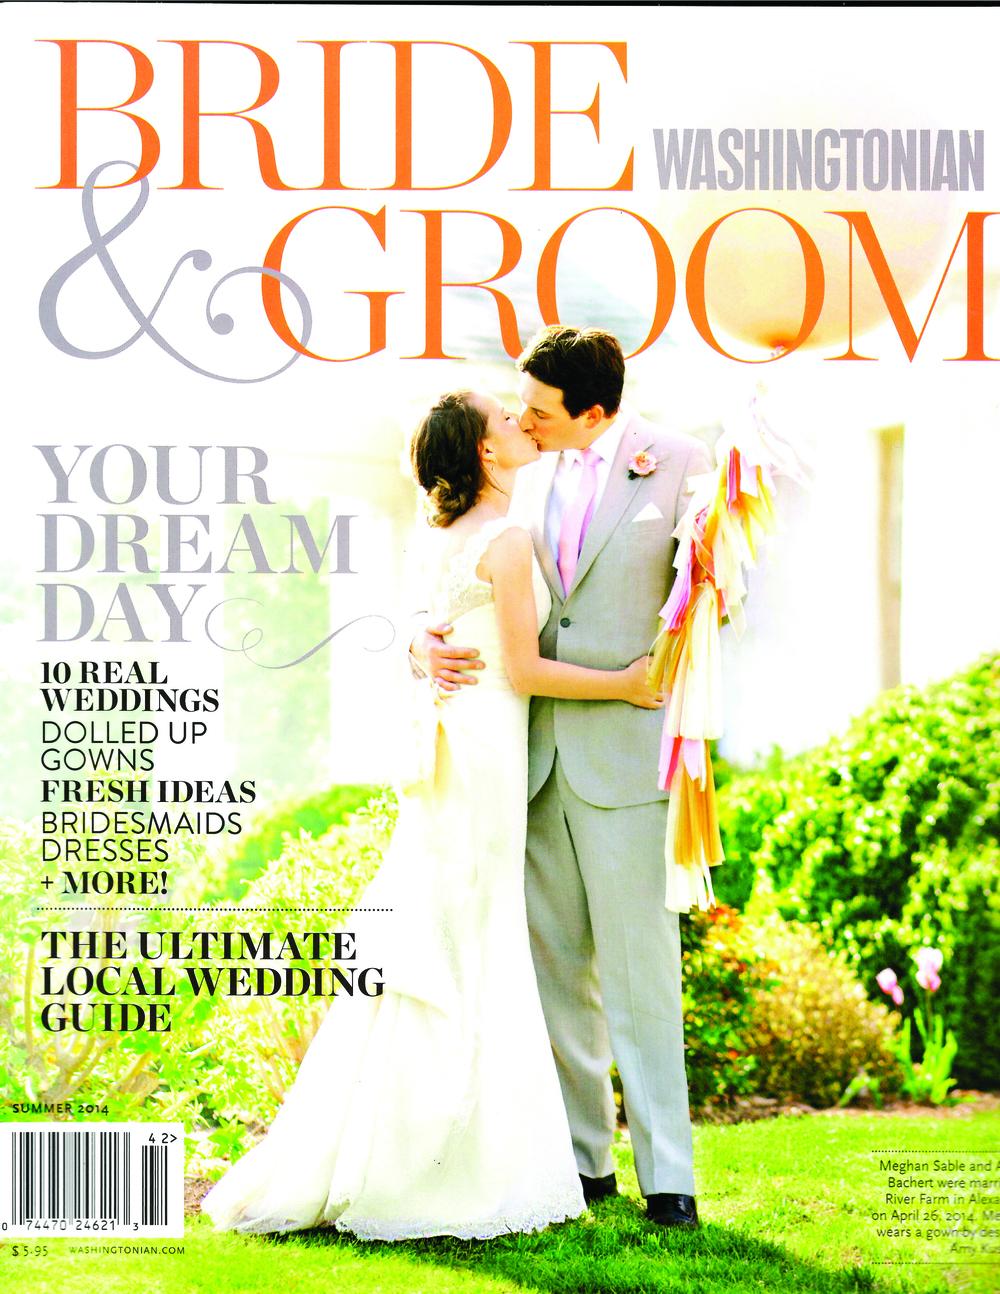 washingtonian-bride-groom-cover-summer-2014-press-victoria-clausen-floral-events.jpg